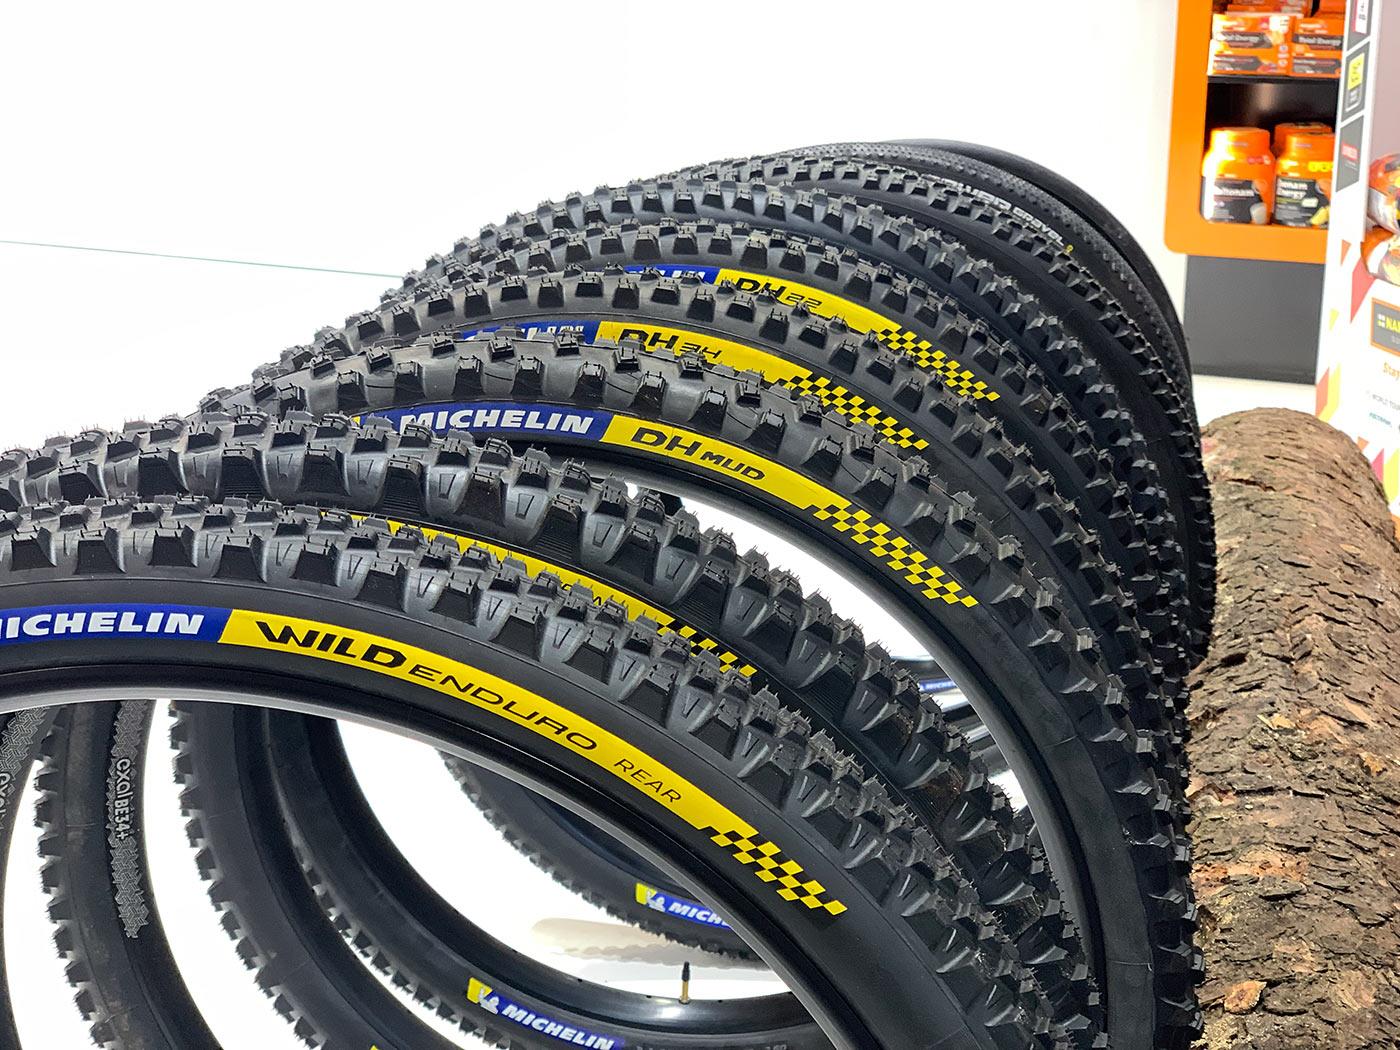 new michelin wild enduro mountain bike tire